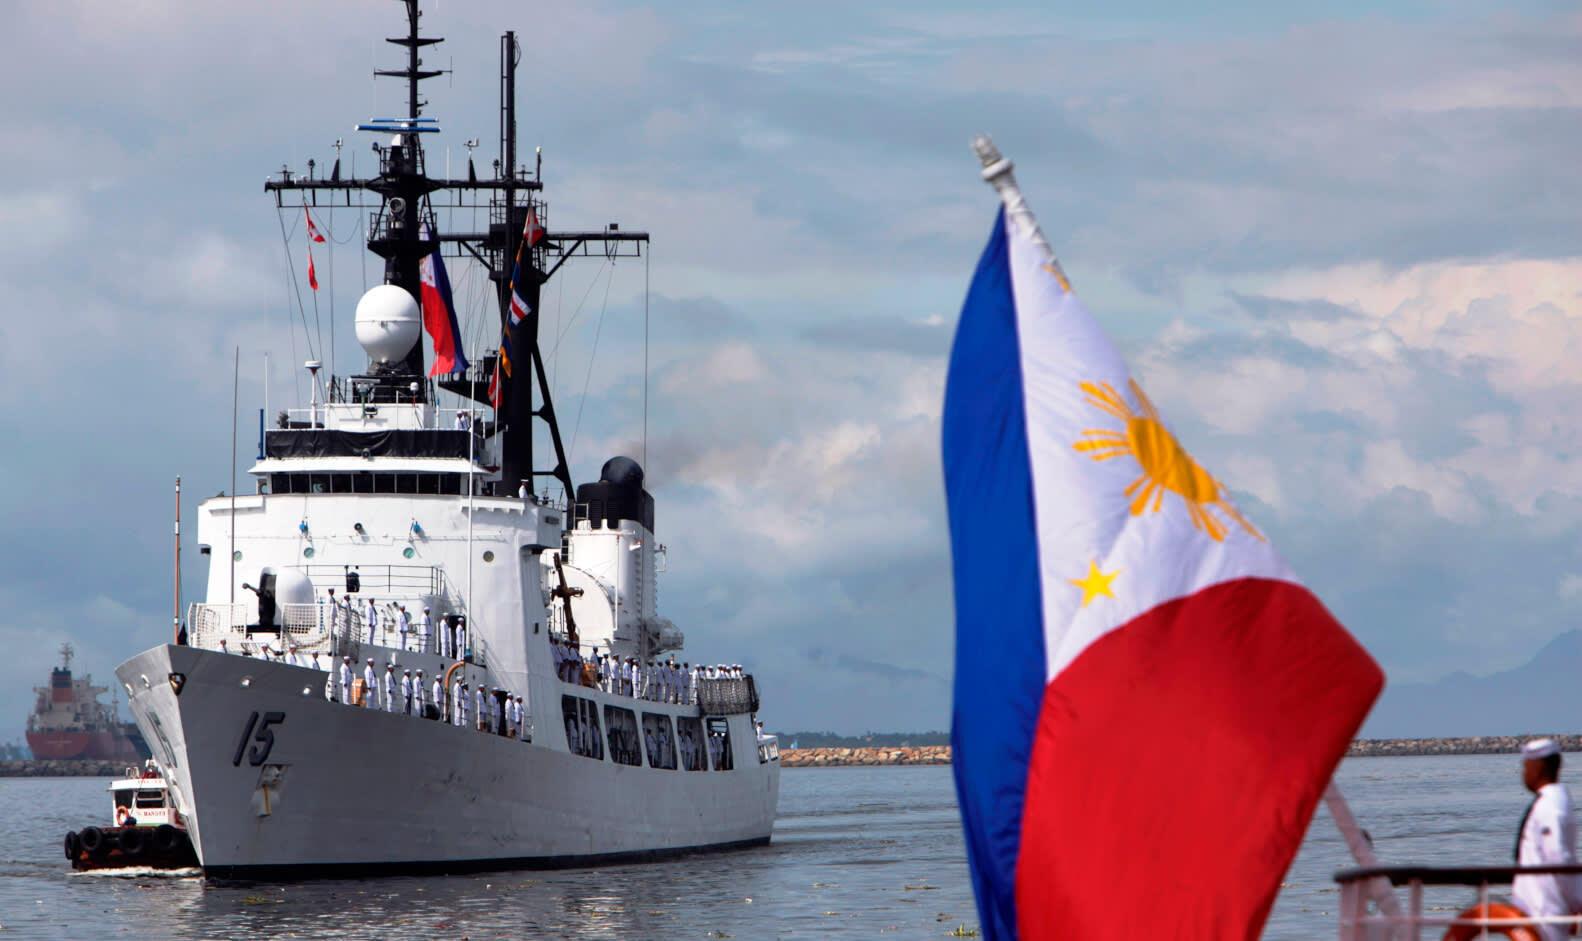 Image d'archive: Philippines' flagship frigate Gregorio Del Pilar